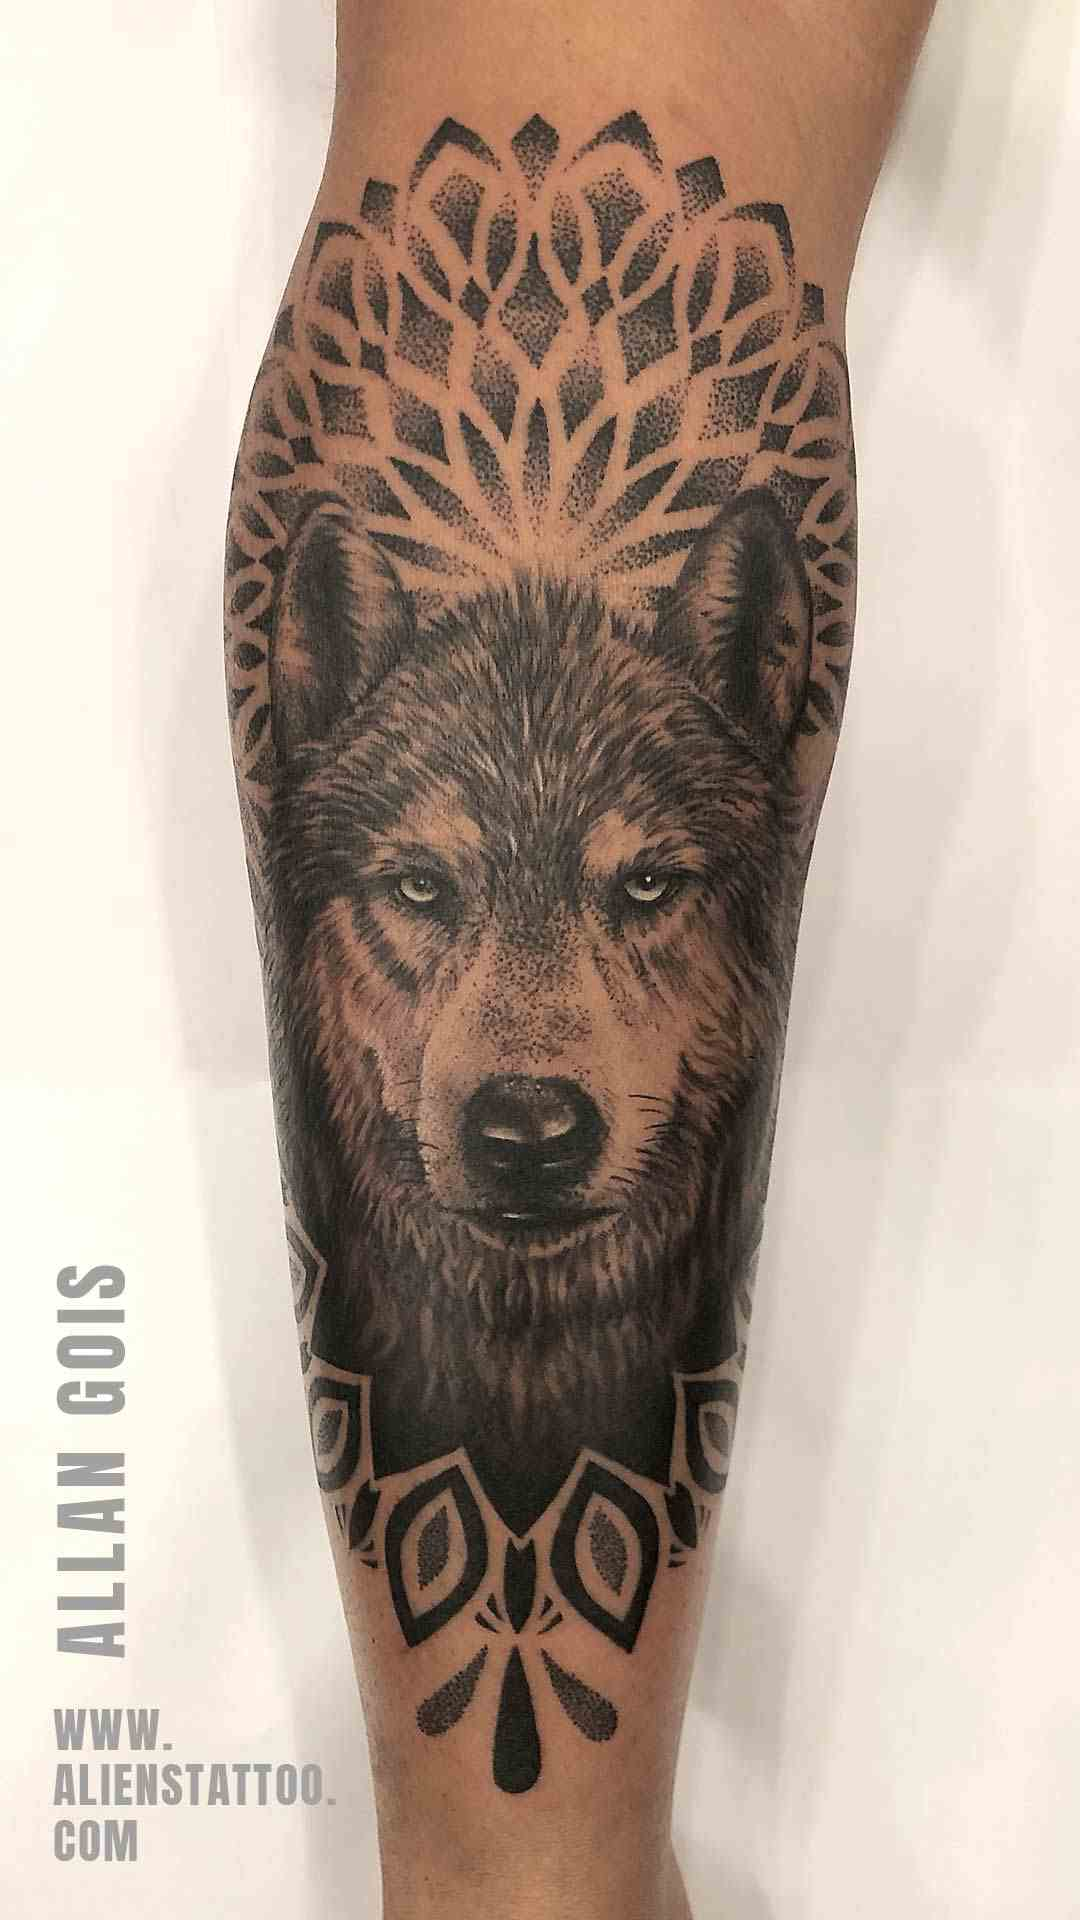 aliens-tattoo-mumbai-arm-cover-wolf